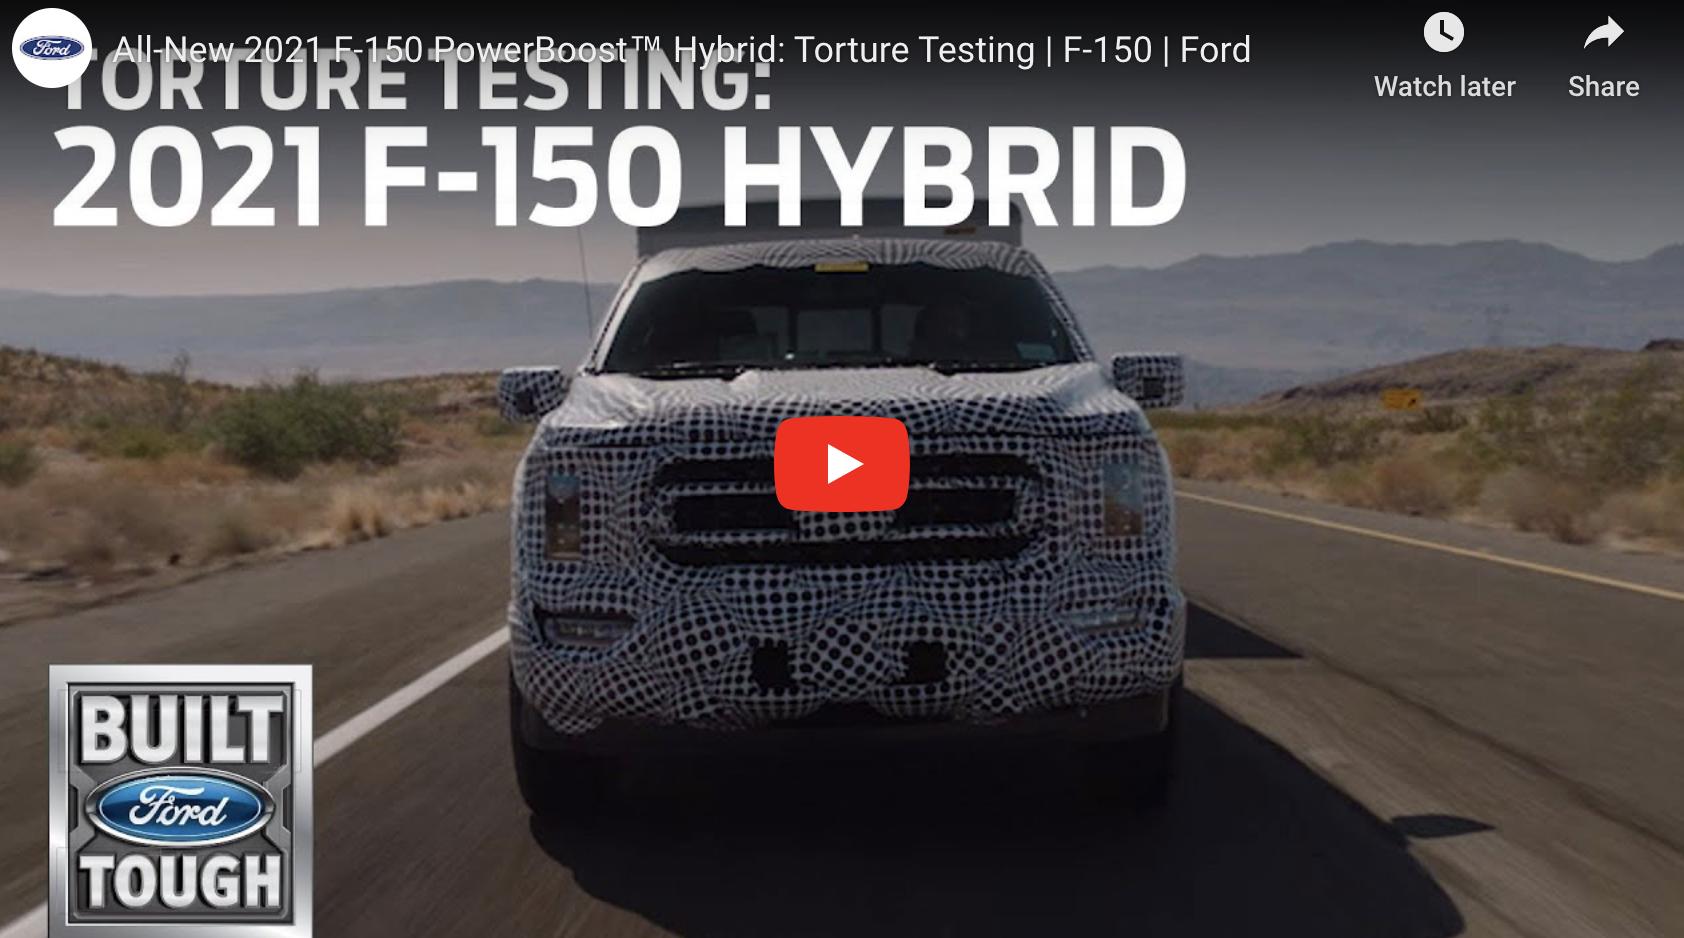 2021 F-150 Hybrid Video